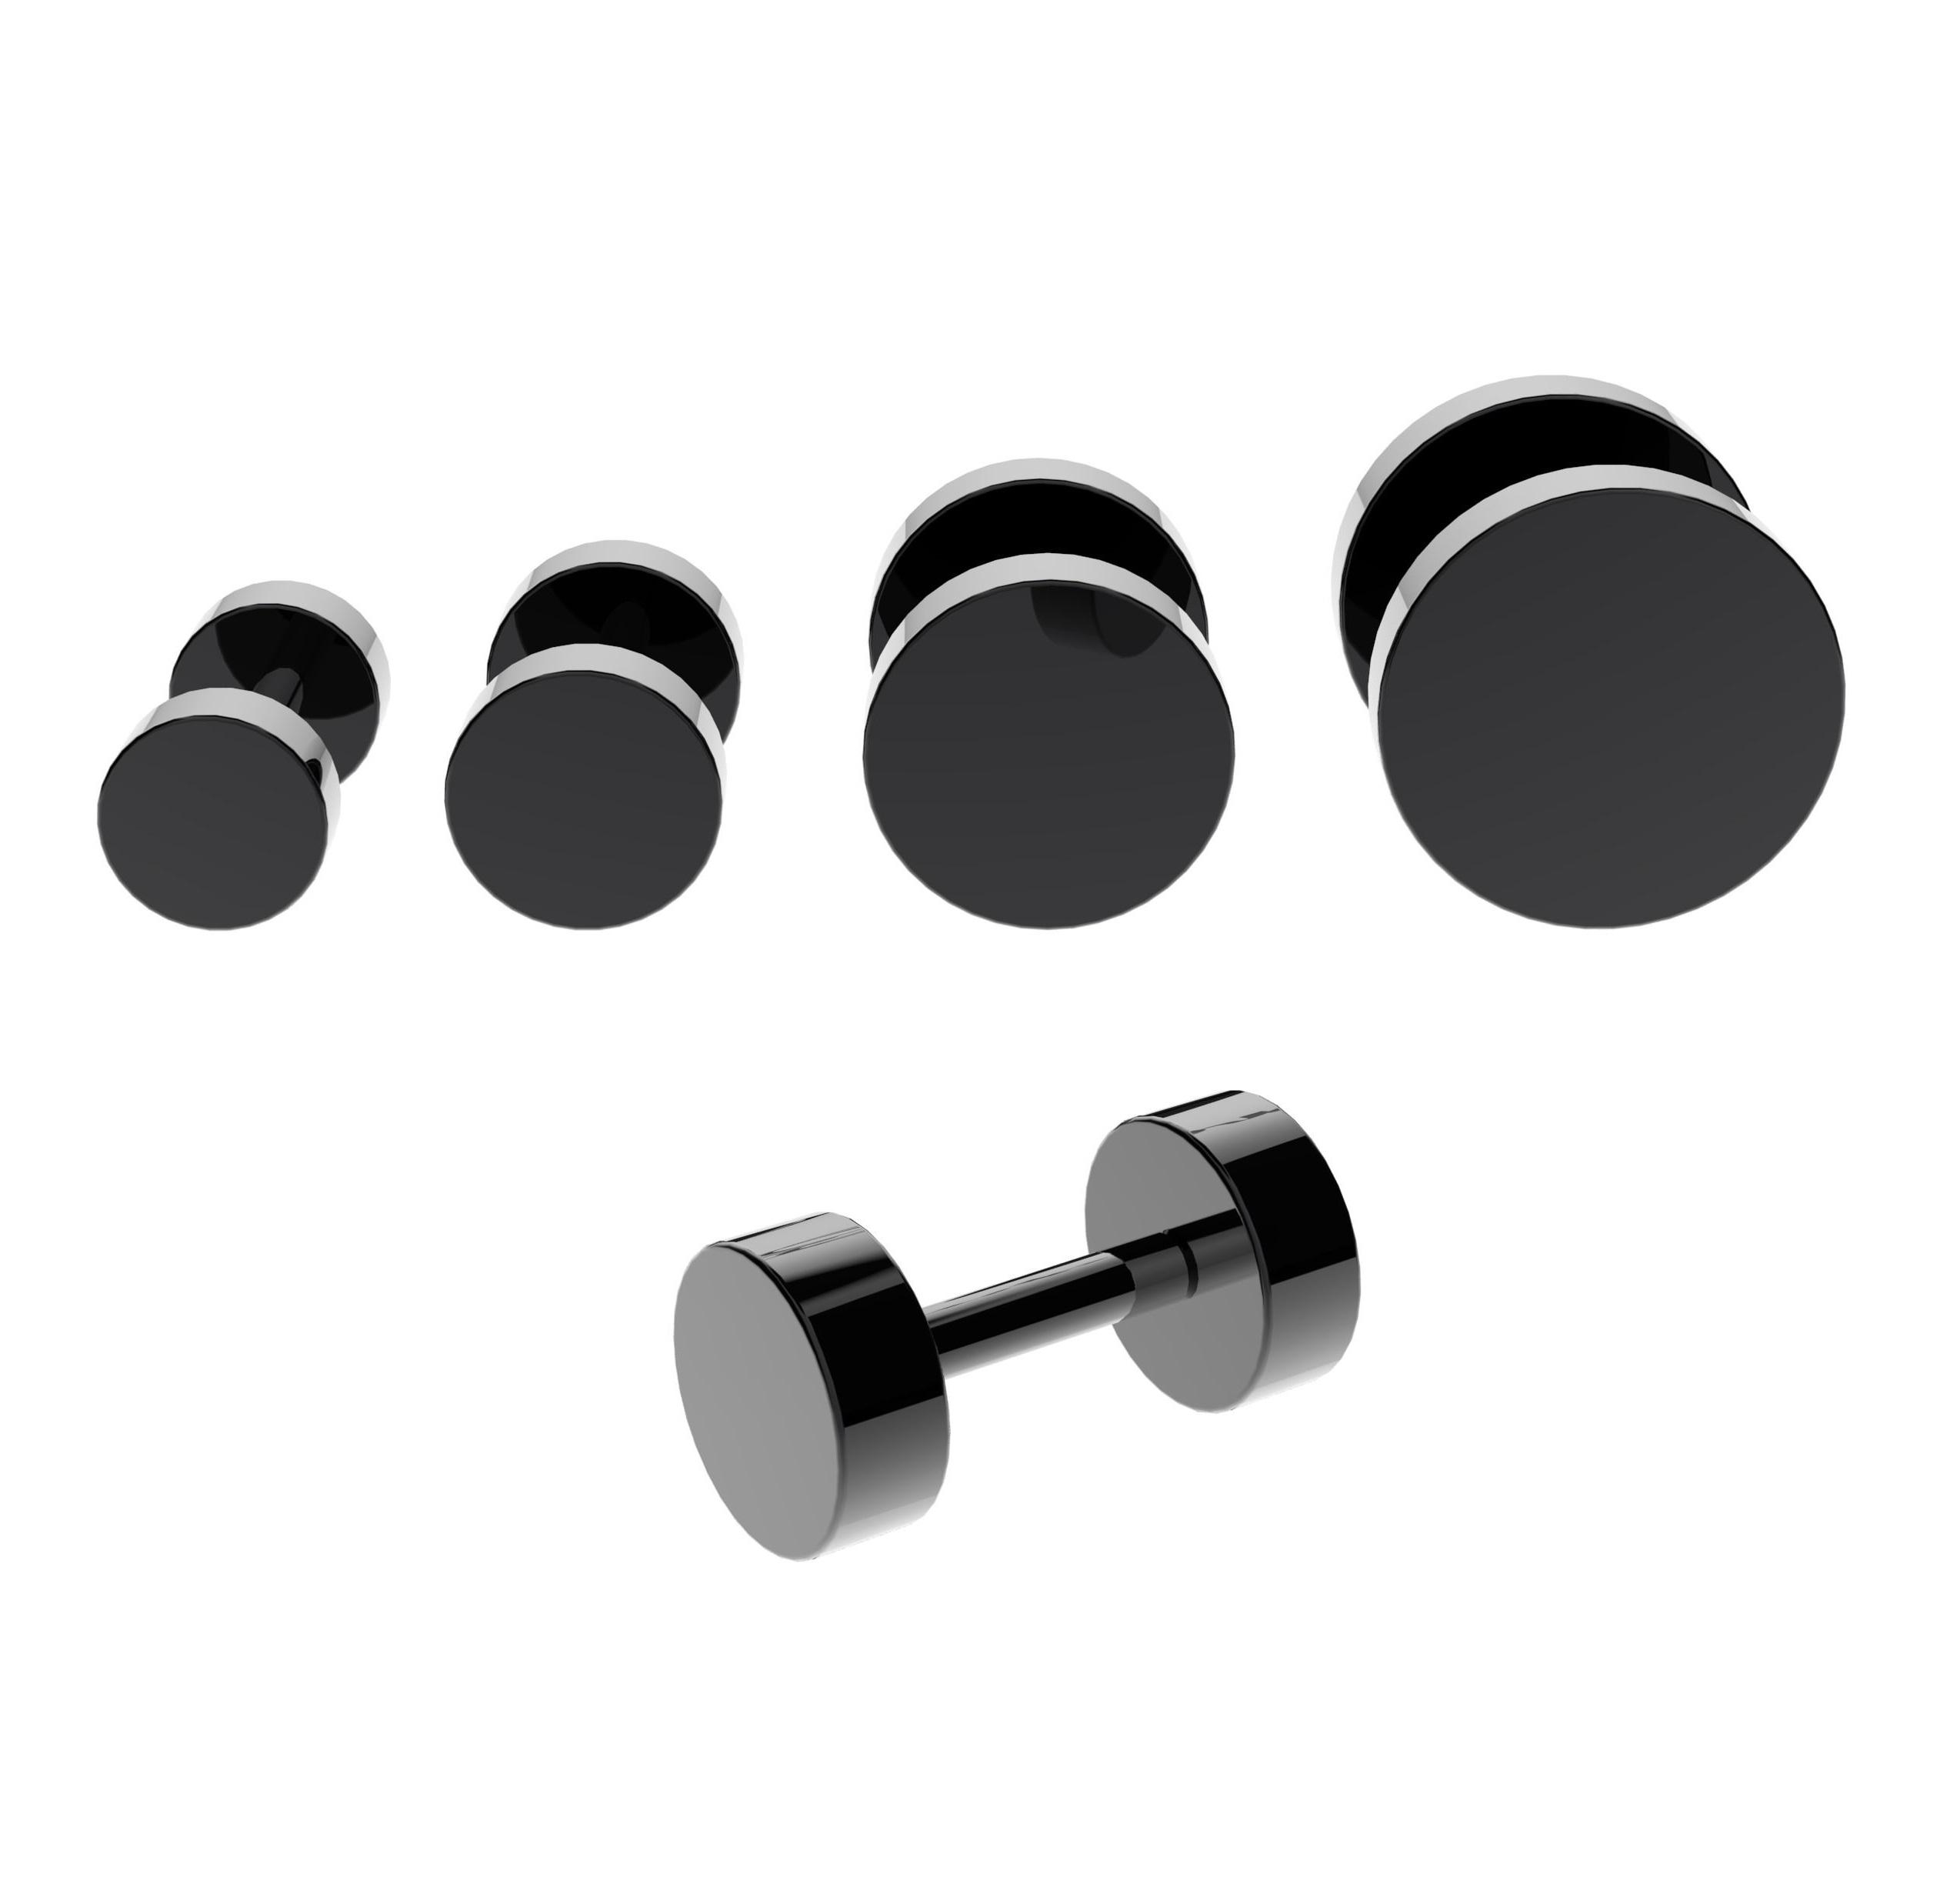 black fake cheater plugs vault 101 limited free uk delivery. Black Bedroom Furniture Sets. Home Design Ideas